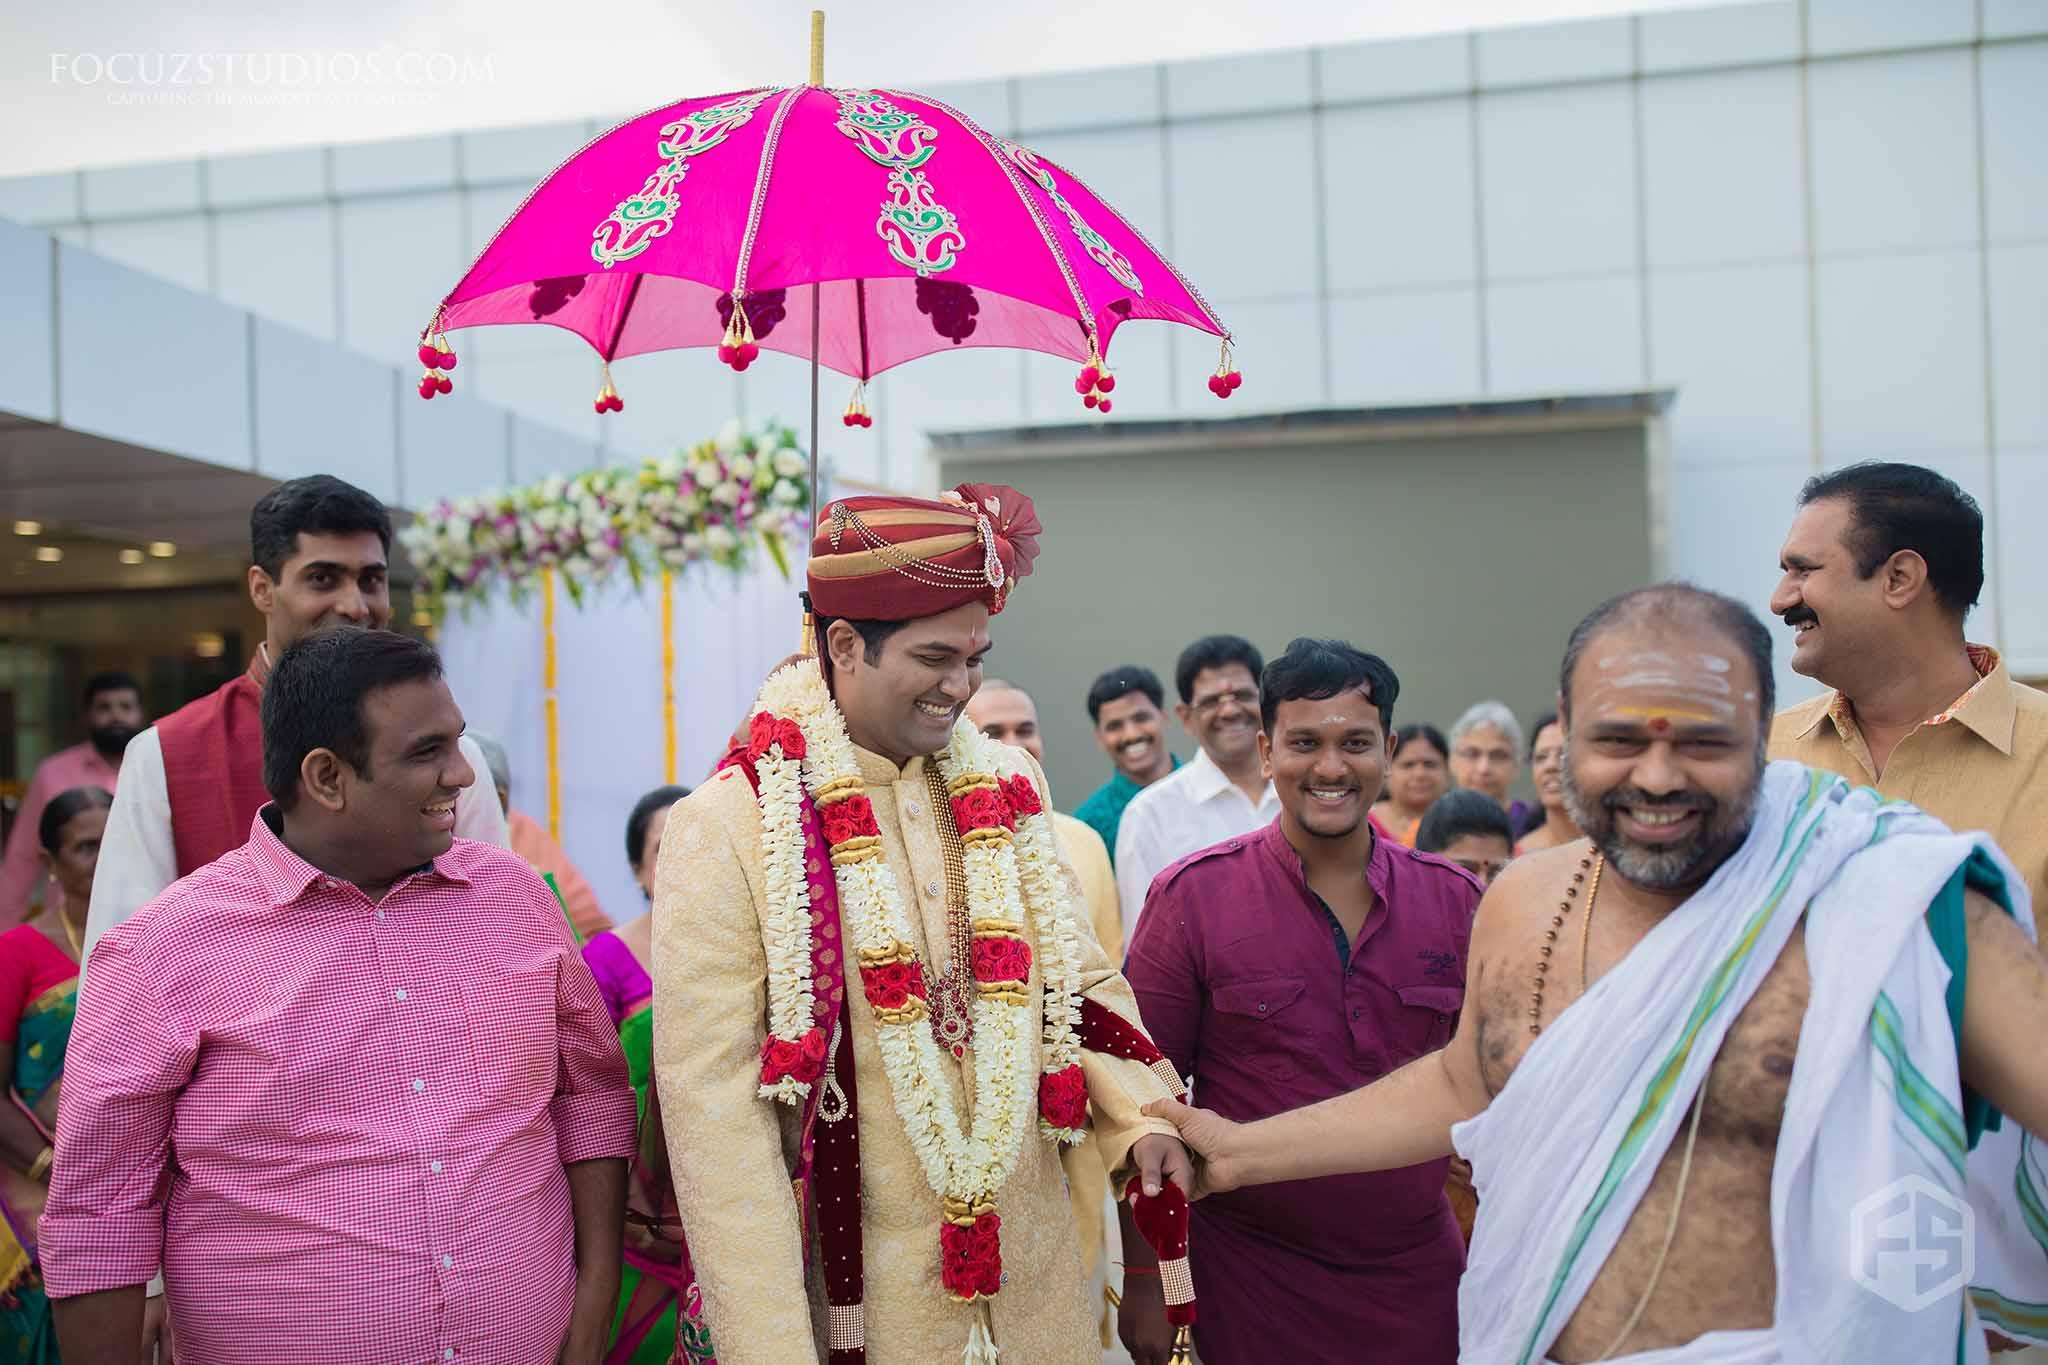 avm-rajeswari-kalyana-mandapam-wedding-photographers-photos-11